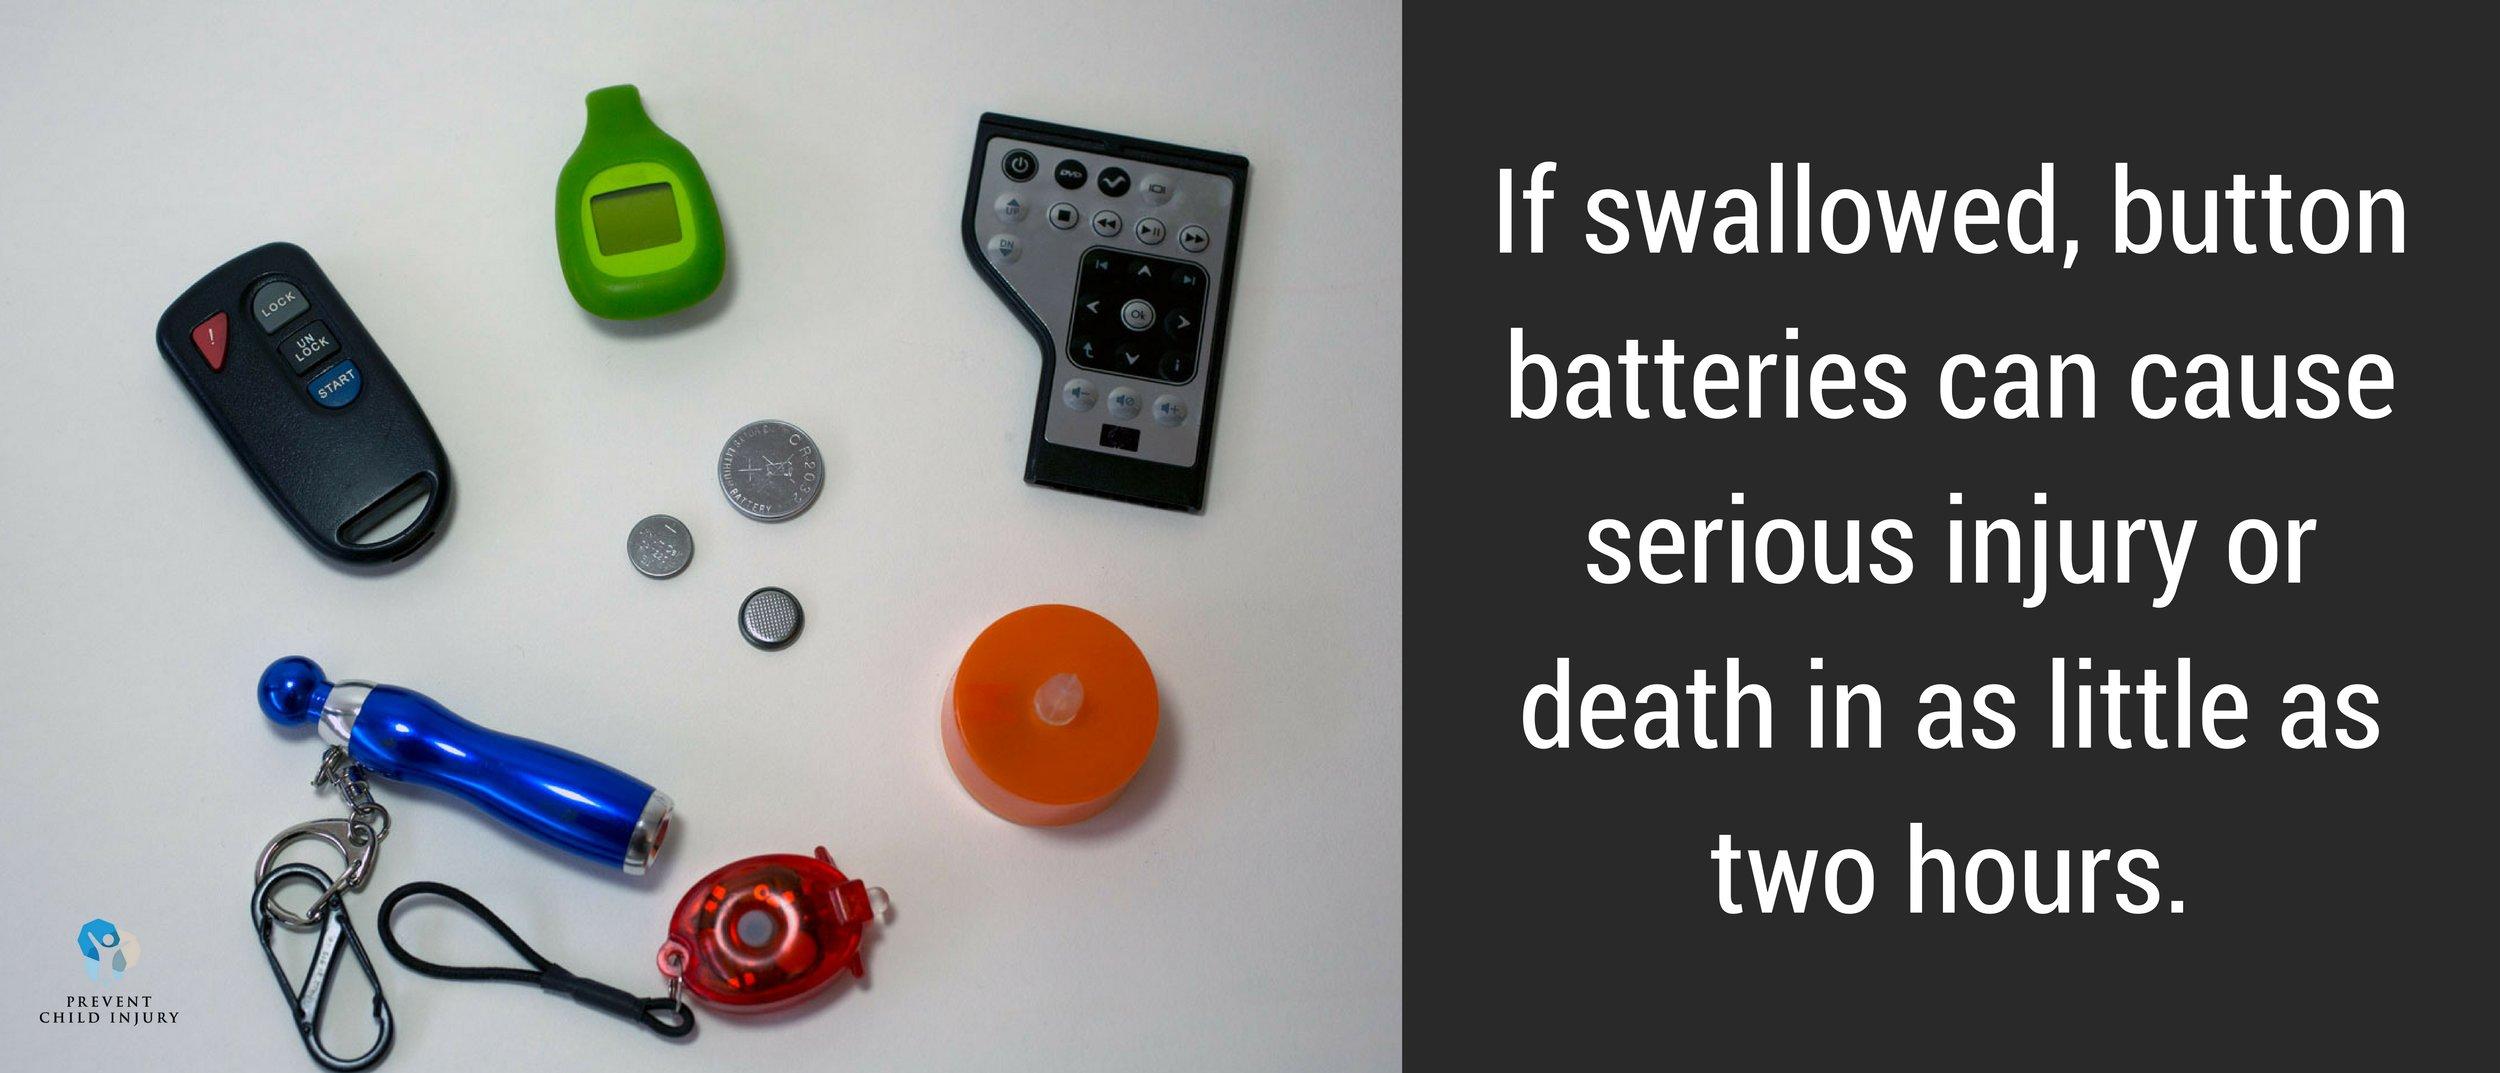 Button battery fact graphic2.jpg